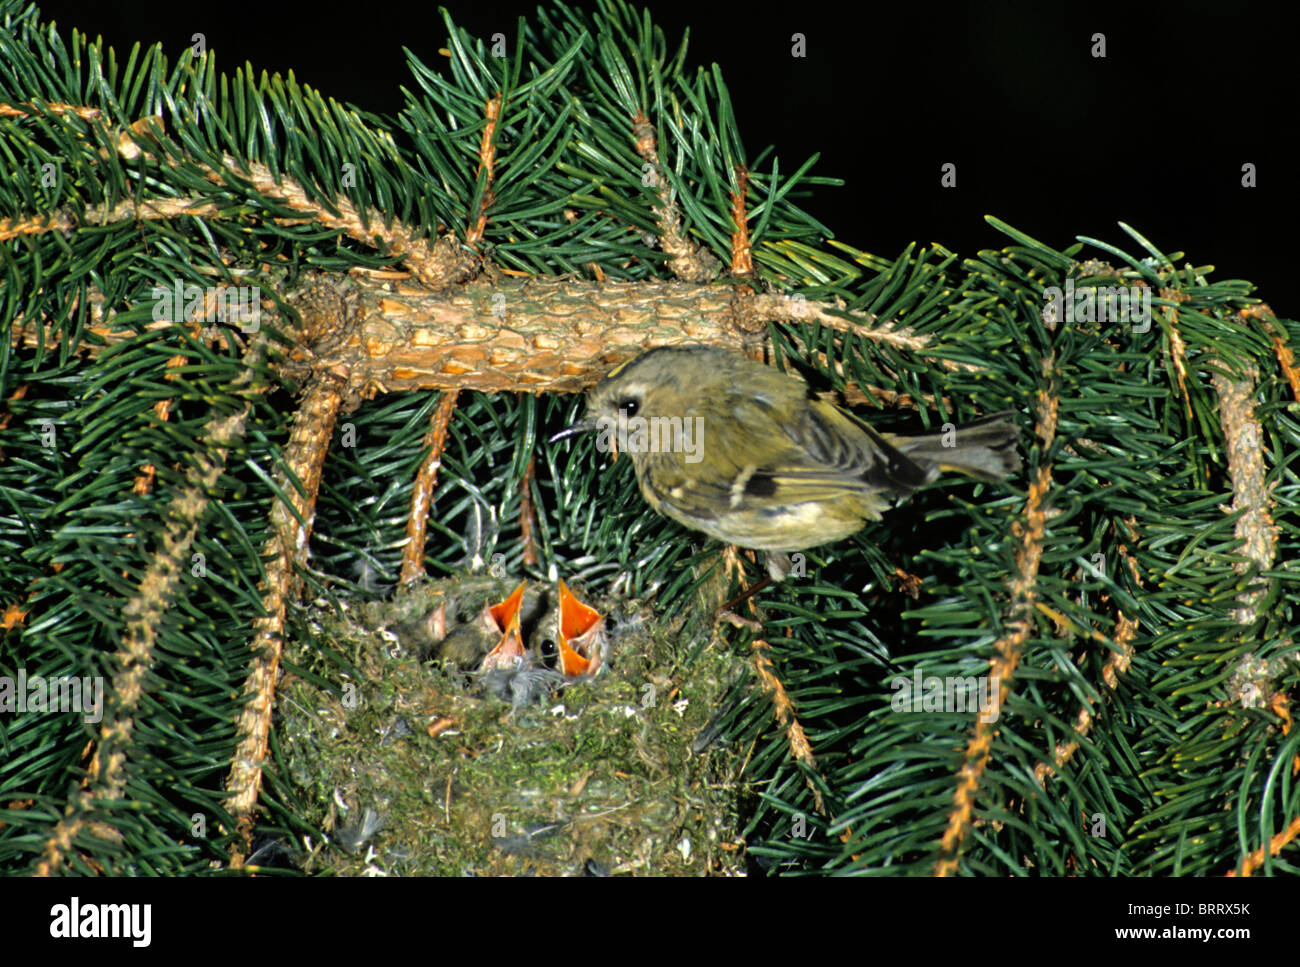 Goldcrest (Regulus regulus) at its nest on a spruce branch - Stock Image